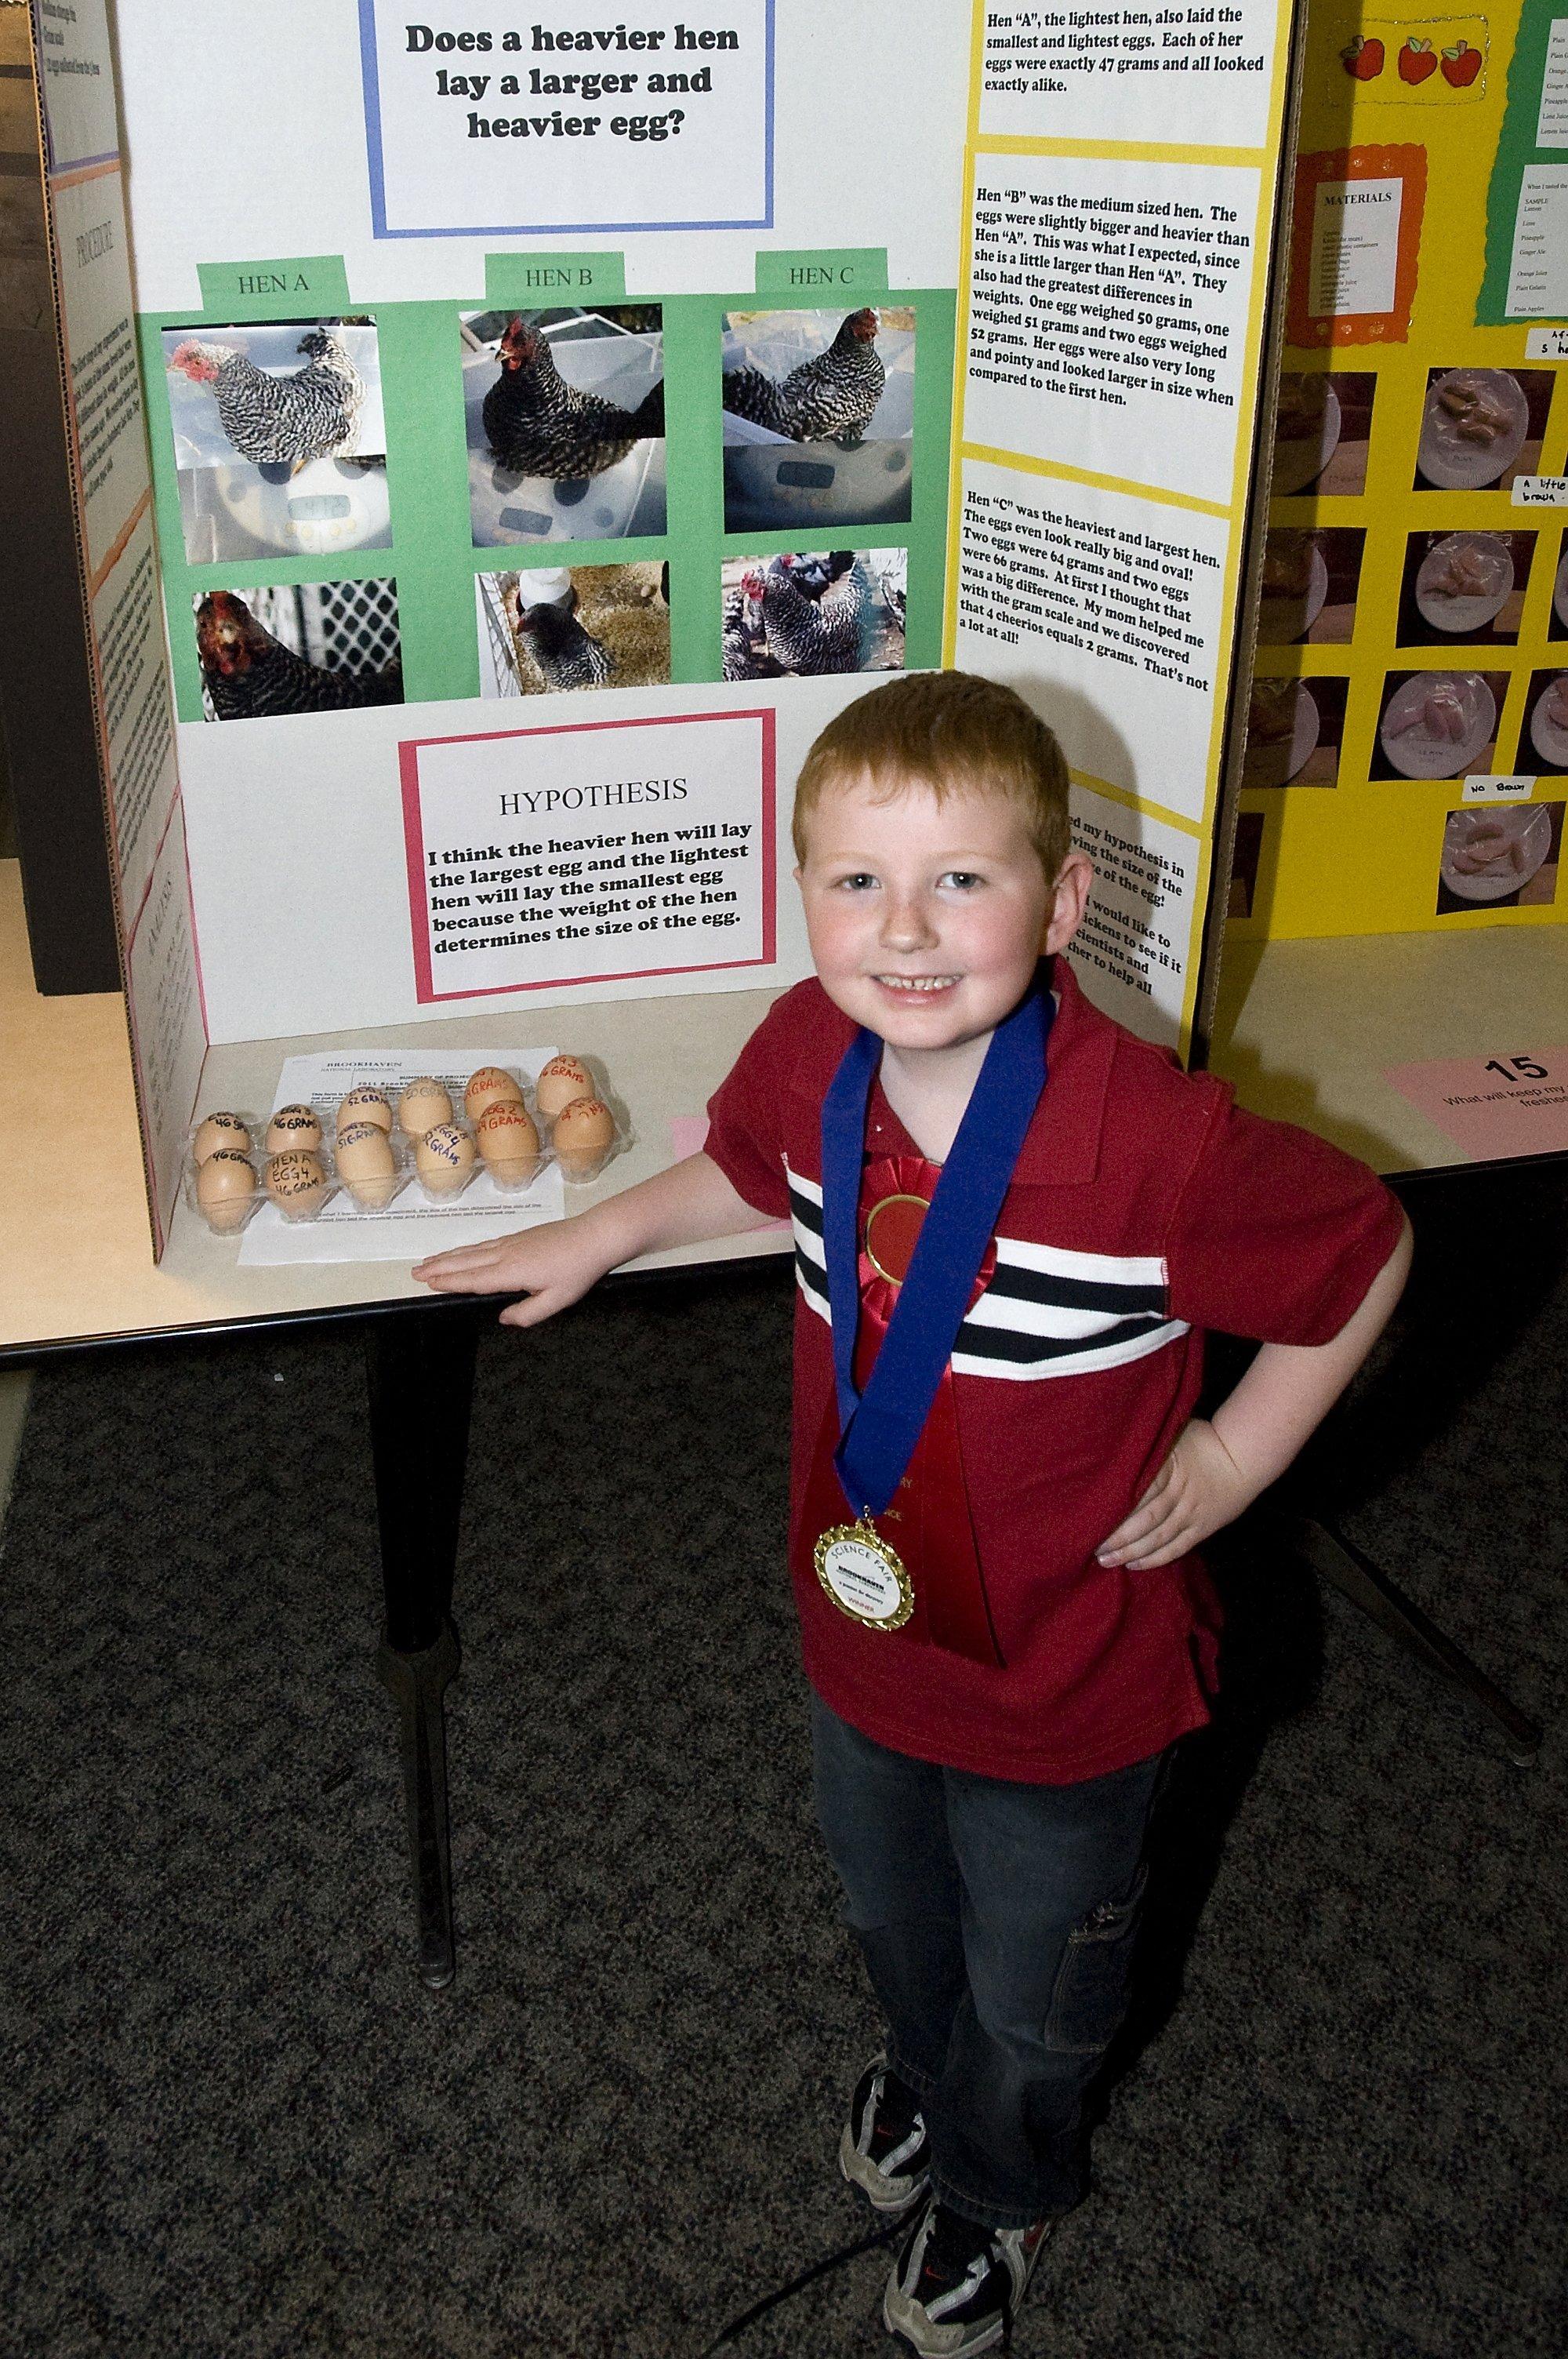 10 Lovable Kindergarten Science Fair Project Ideas bnl newsroom ideas collection kindergarten science fair projects 2020